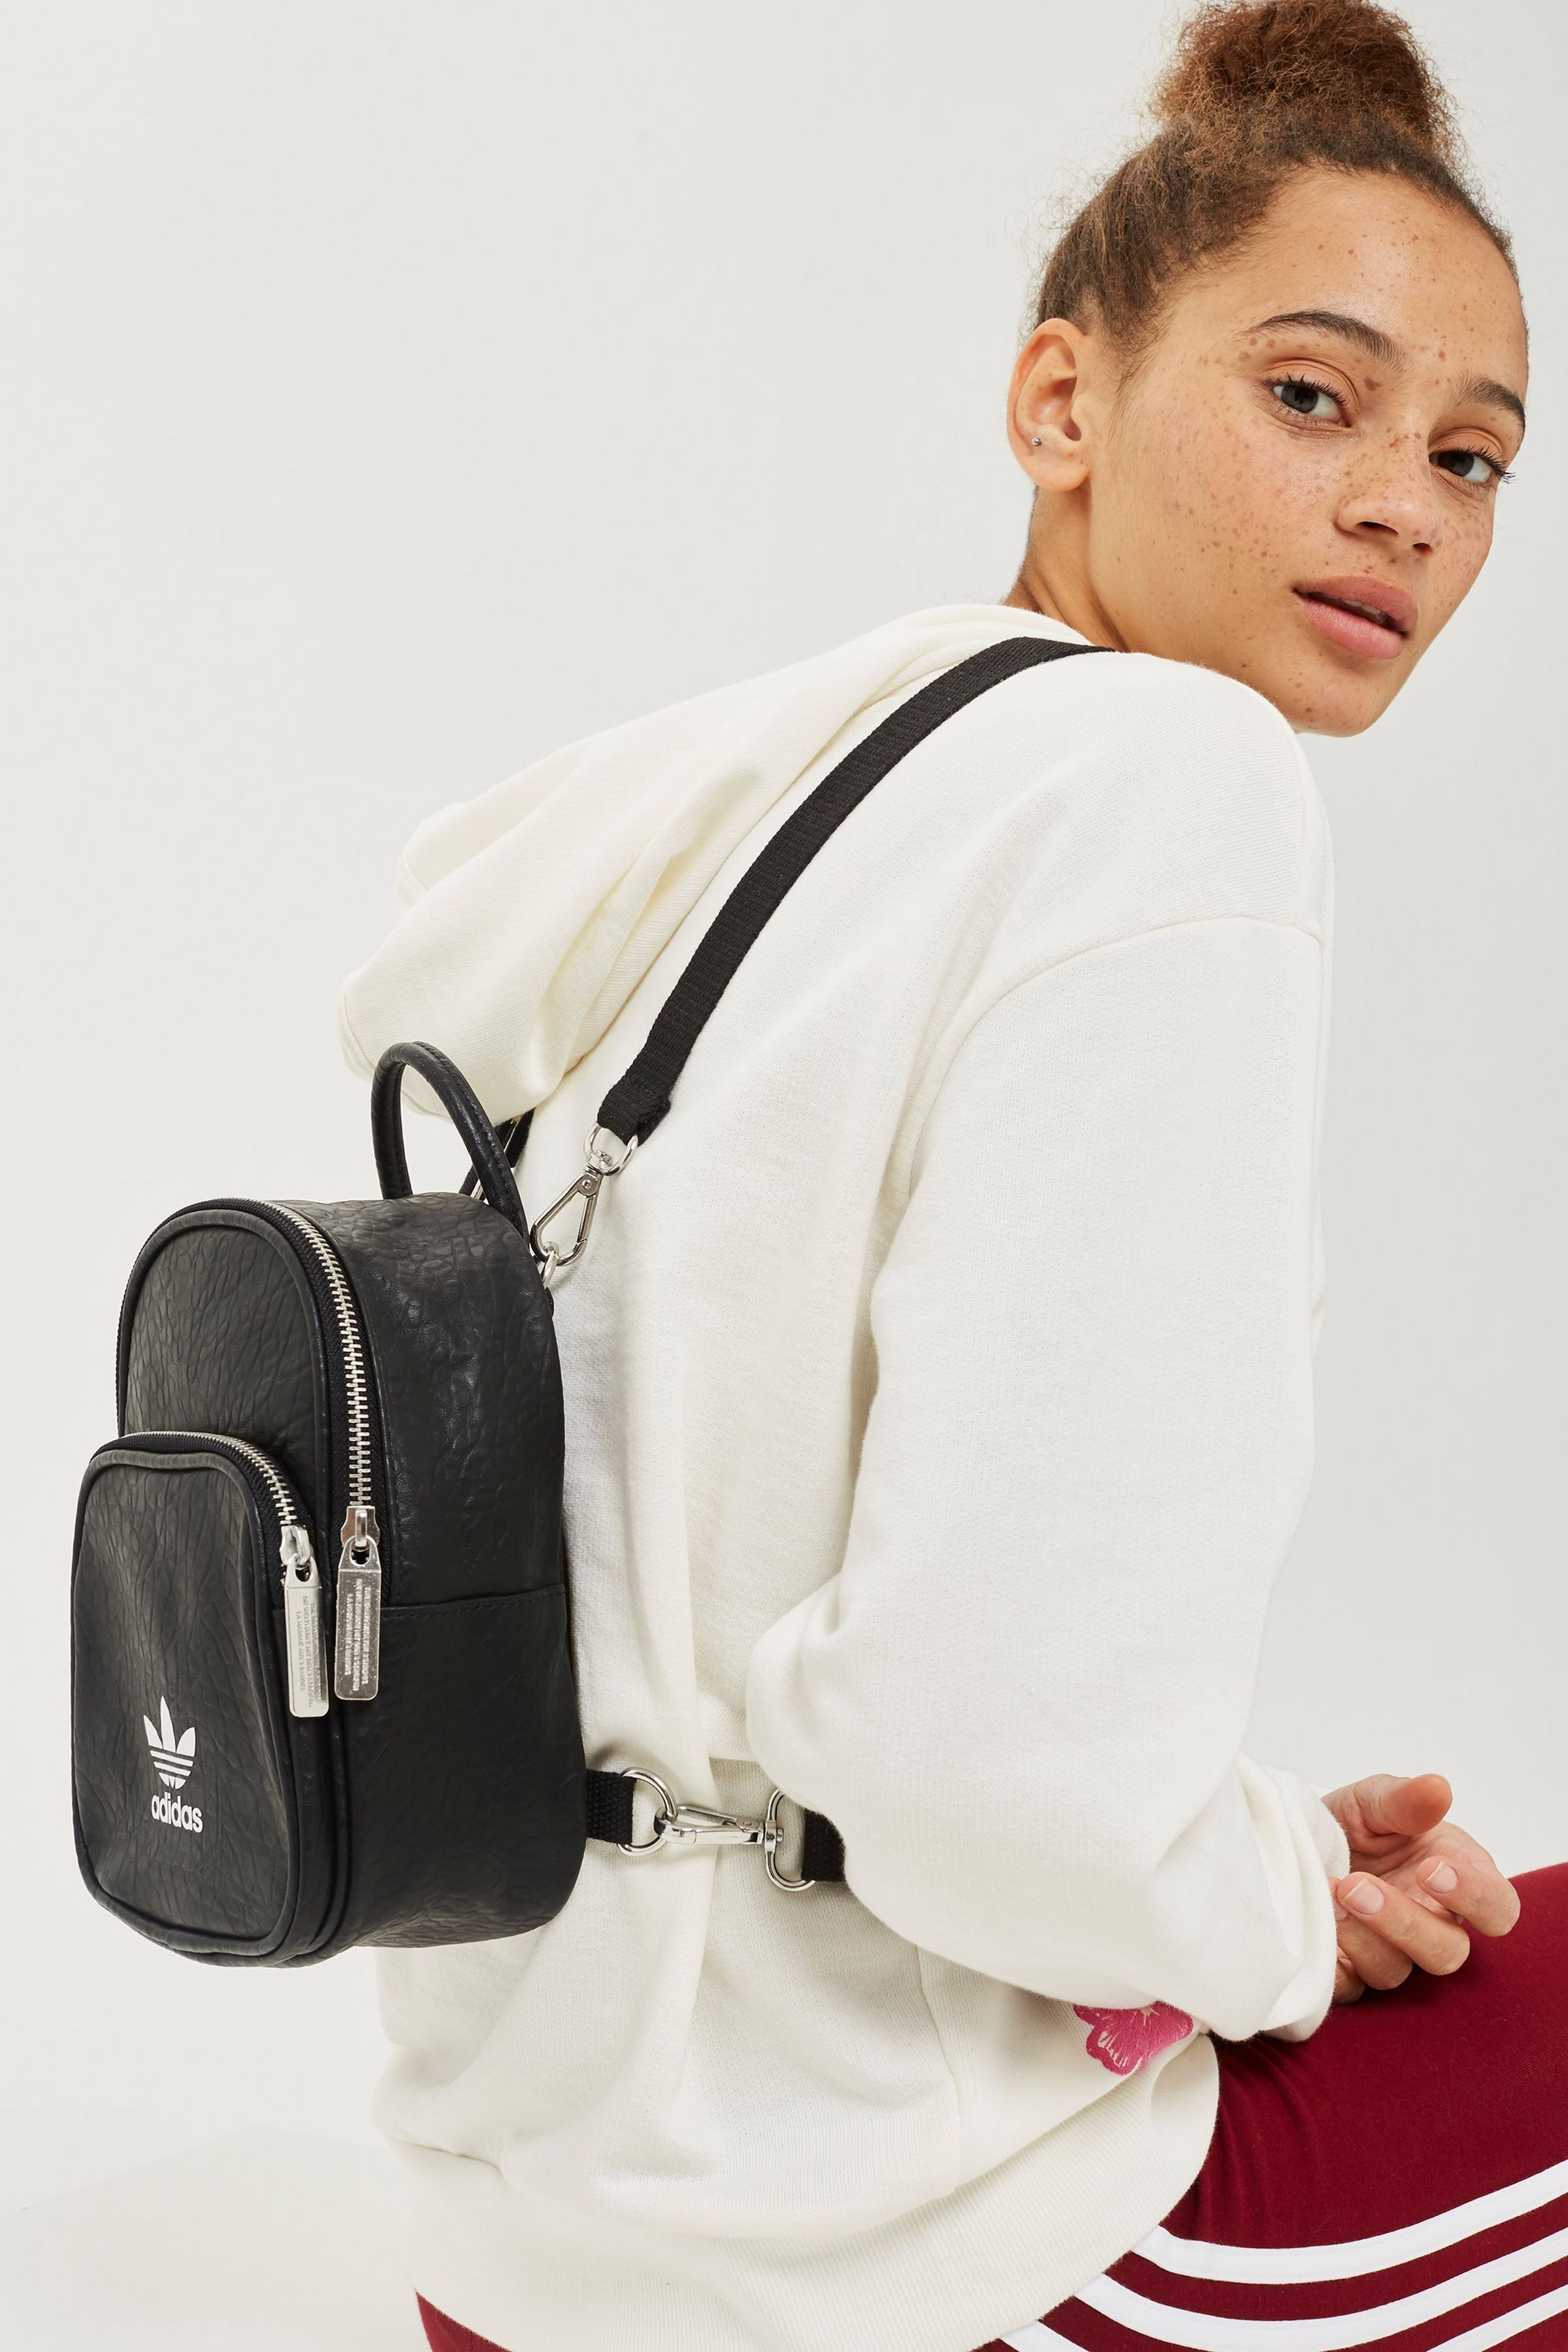 Te mejorarás regla corto  Mini Backpack by adidas Originals | Mochilas adidas feminina, Muchilas  femininas, Acessórios